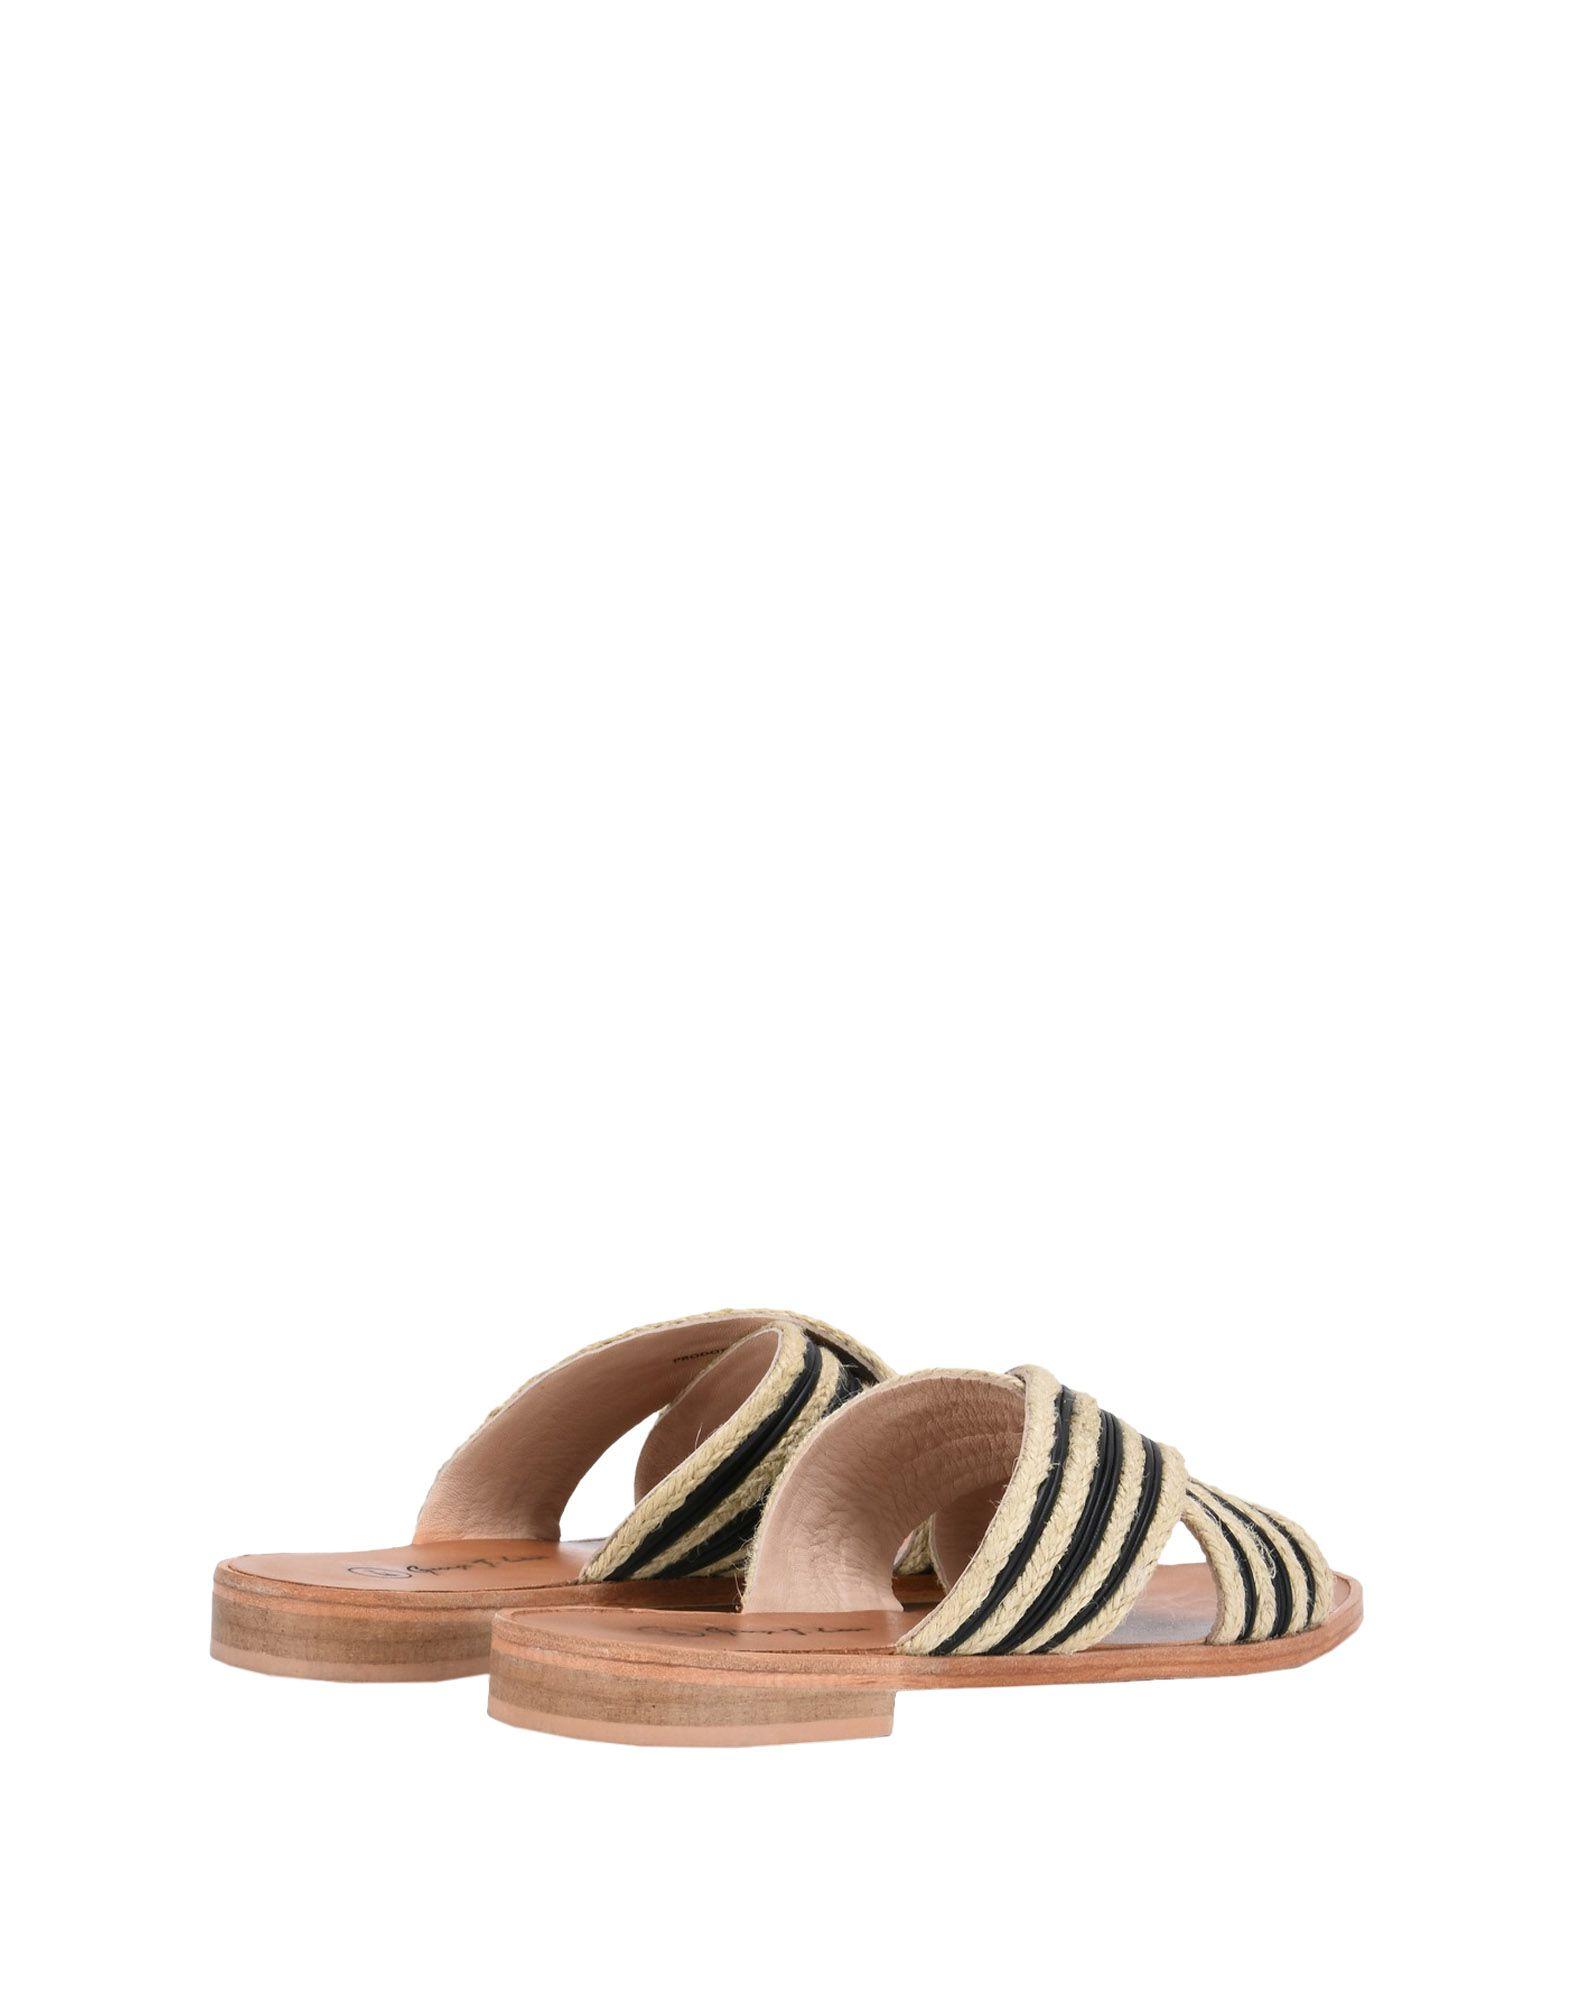 George J. Love Sandalen Schuhe Damen  11468958LB Neue Schuhe Sandalen bd9a4f